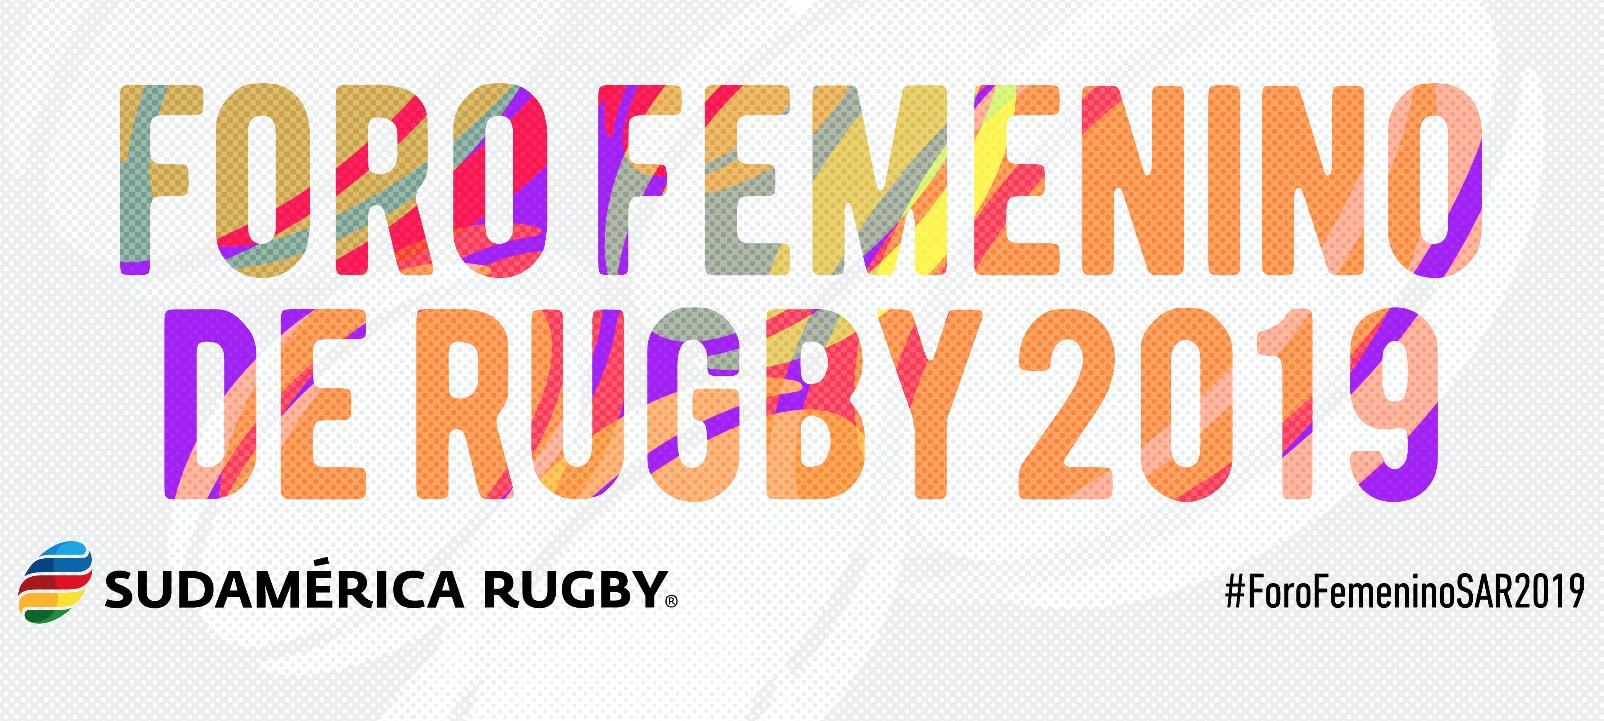 #ForoFemeninoSAR2019 - participará World Rugby